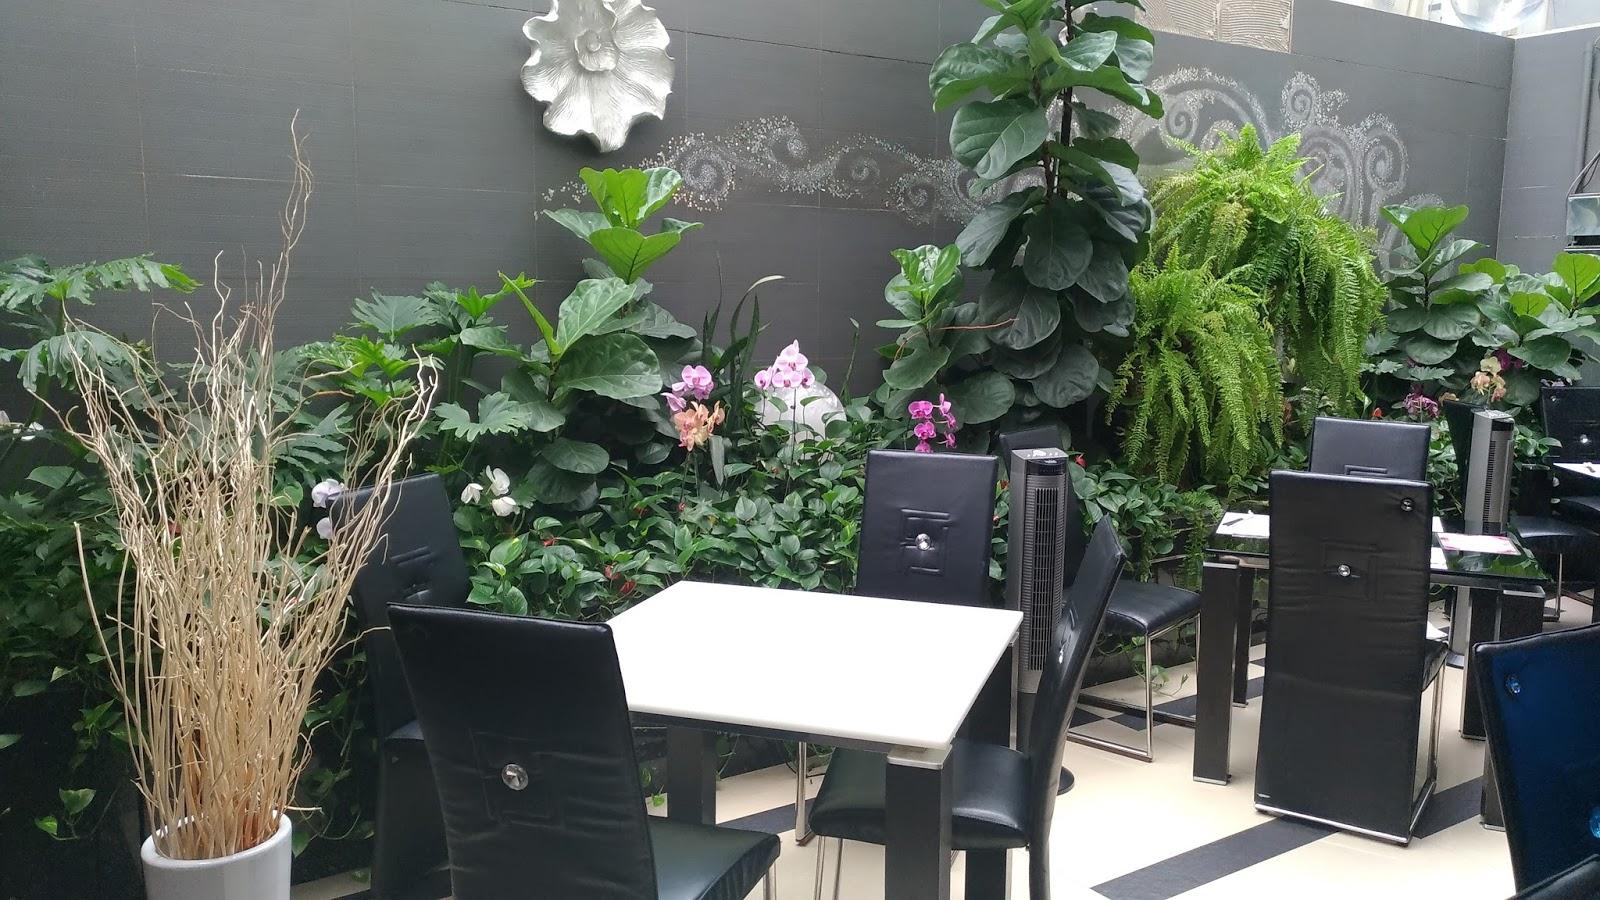 P 20170712 142821 vHDR Auto - 【嘉義美食】皇爵大飯店-優雅平價的豪華套餐,就在火車站旁!